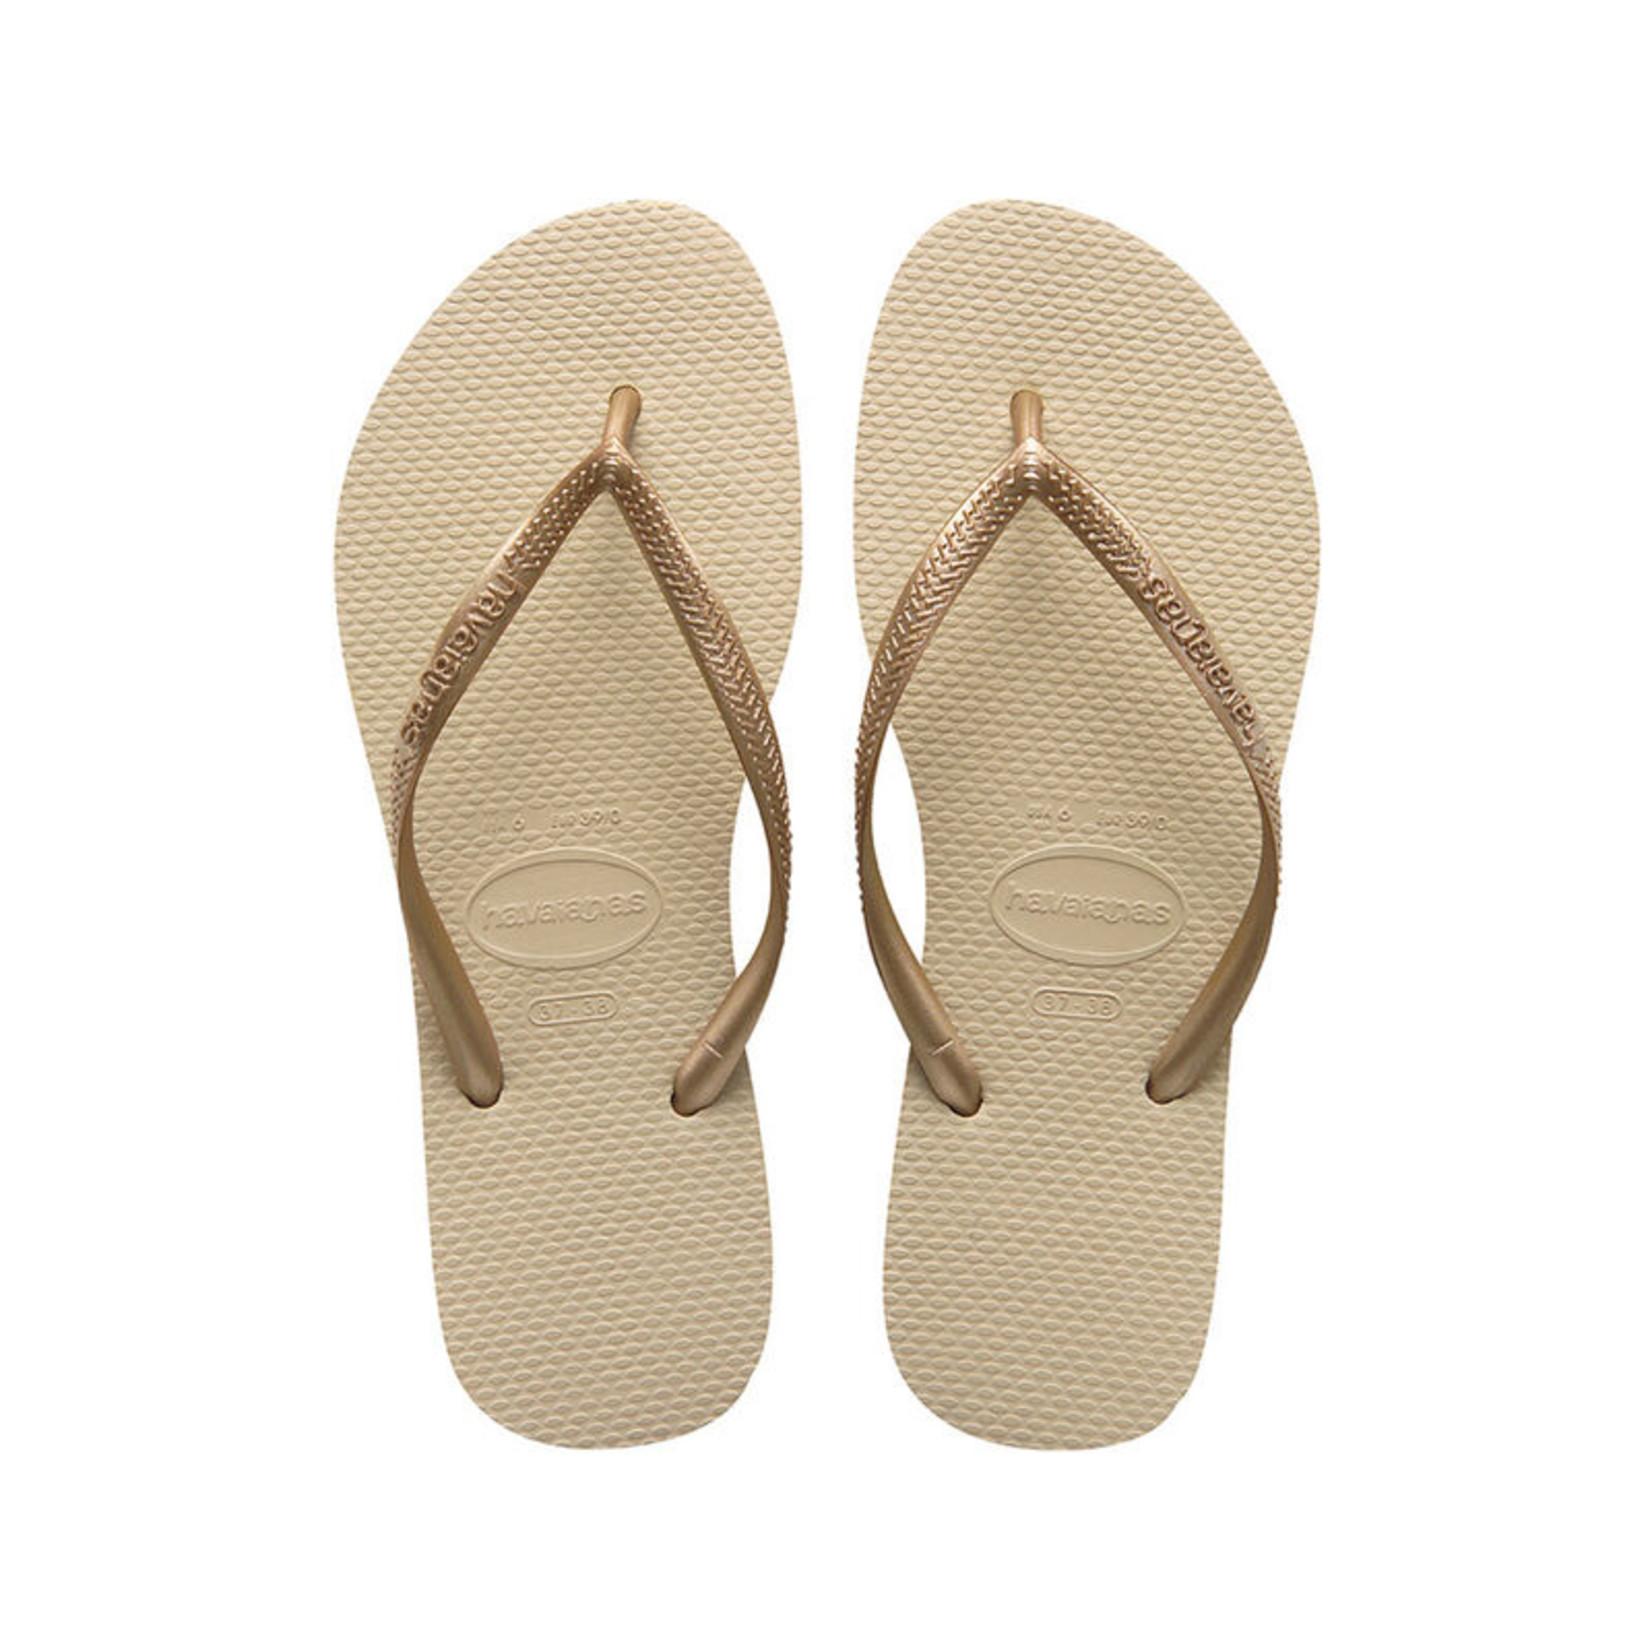 Havaianas Havaianas Slim Sandal Sand Grey/Light Golden FlipFlops